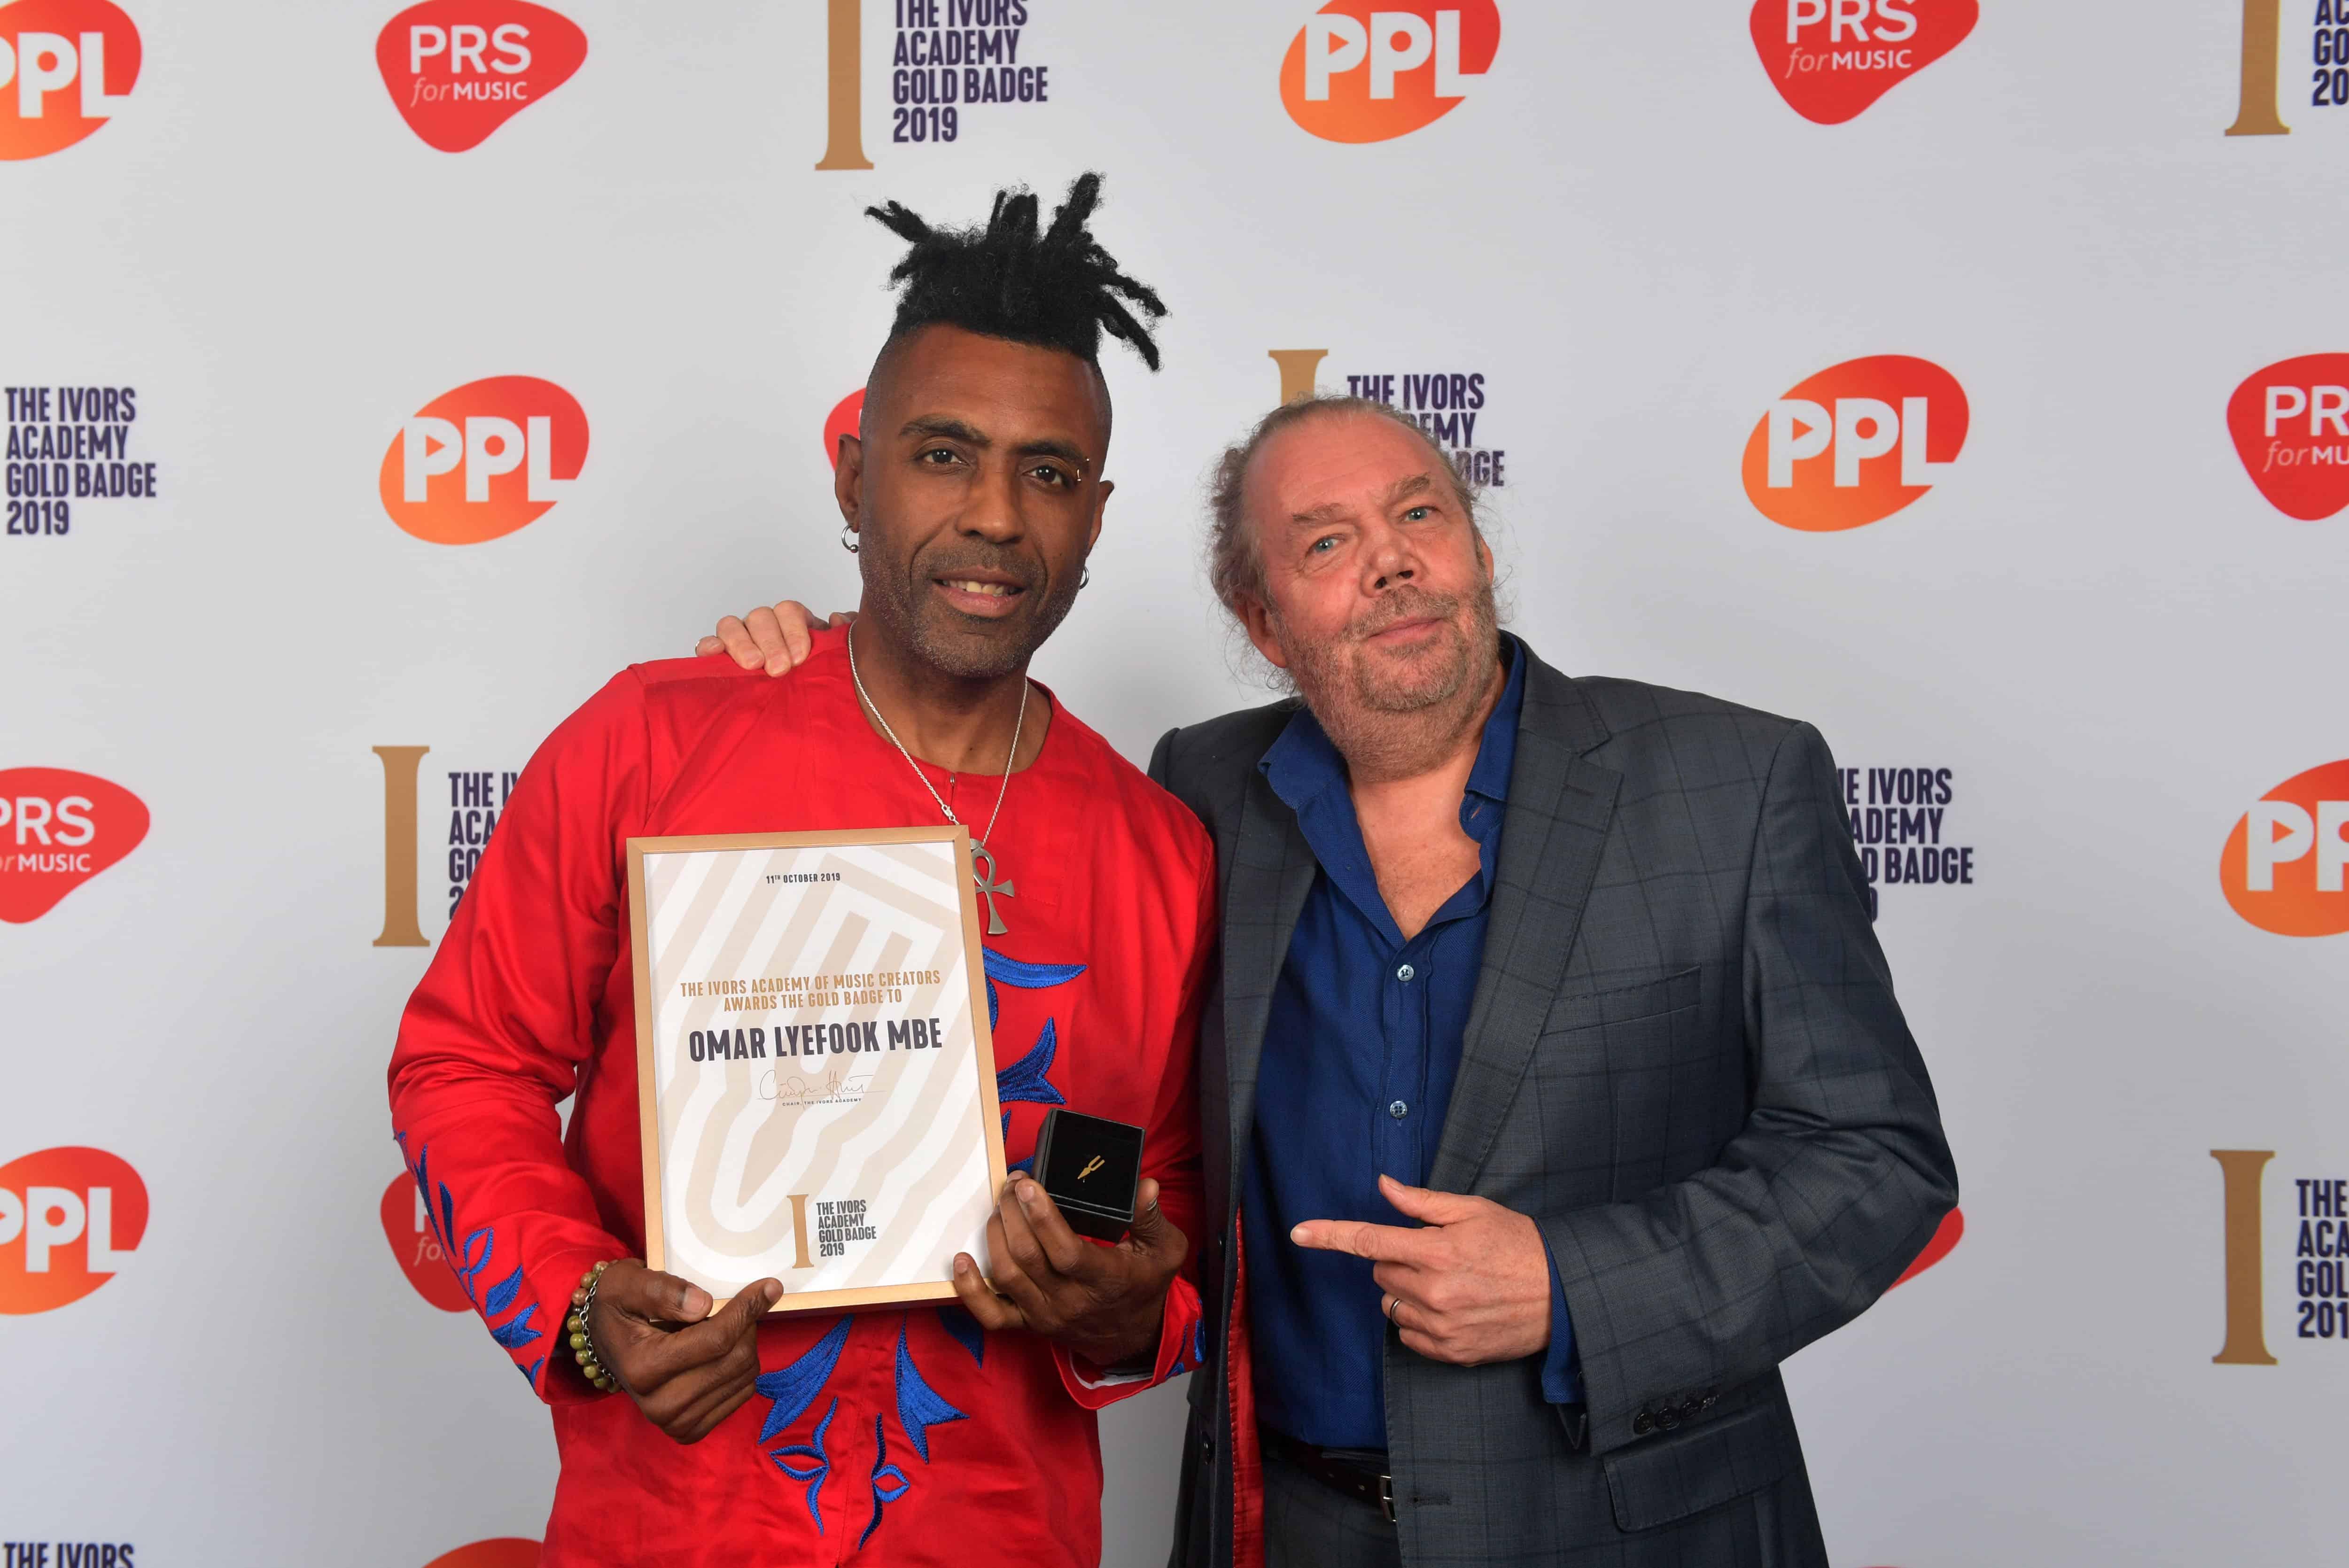 Gold Badge recipient Omar Lyefook MBE with presenter Gordon Mac